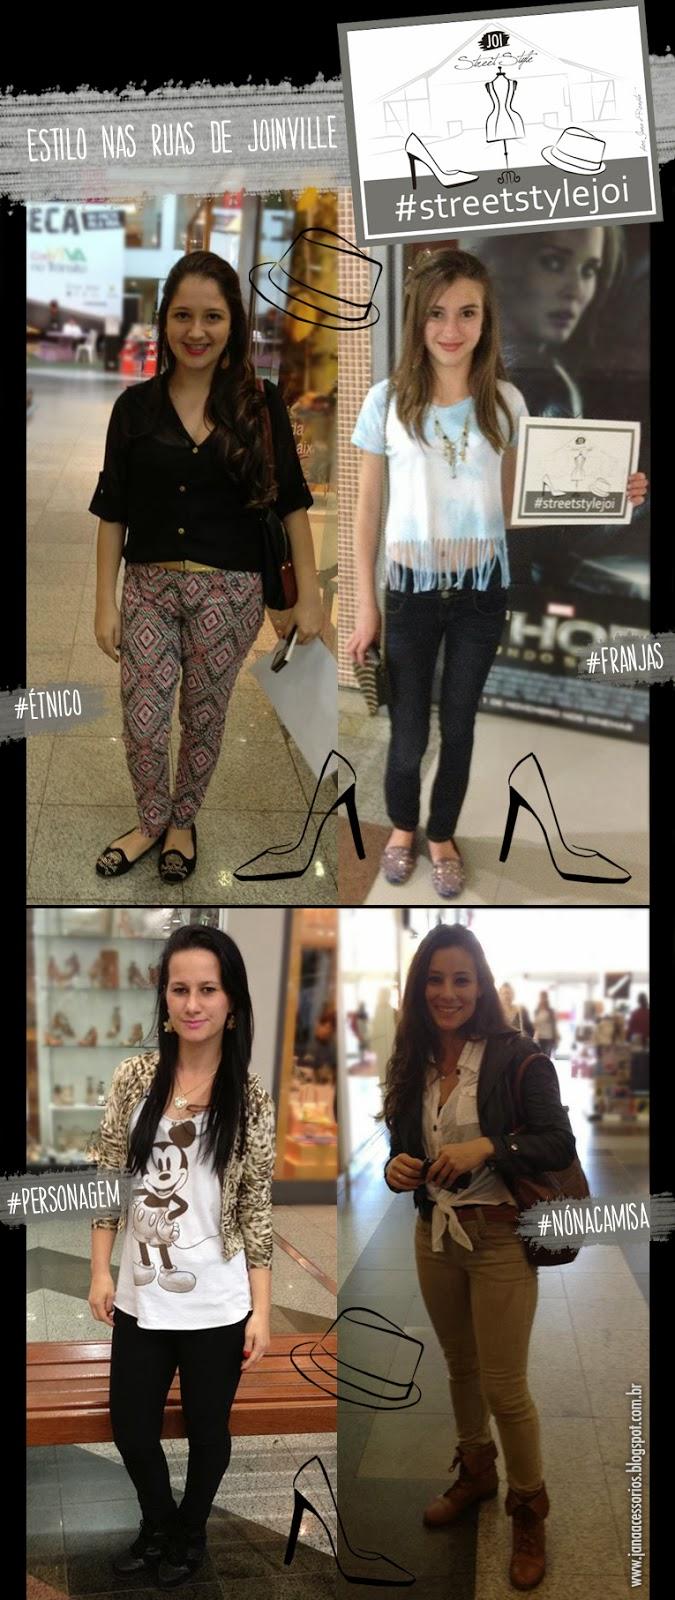 Joinville, Estilo, Moda